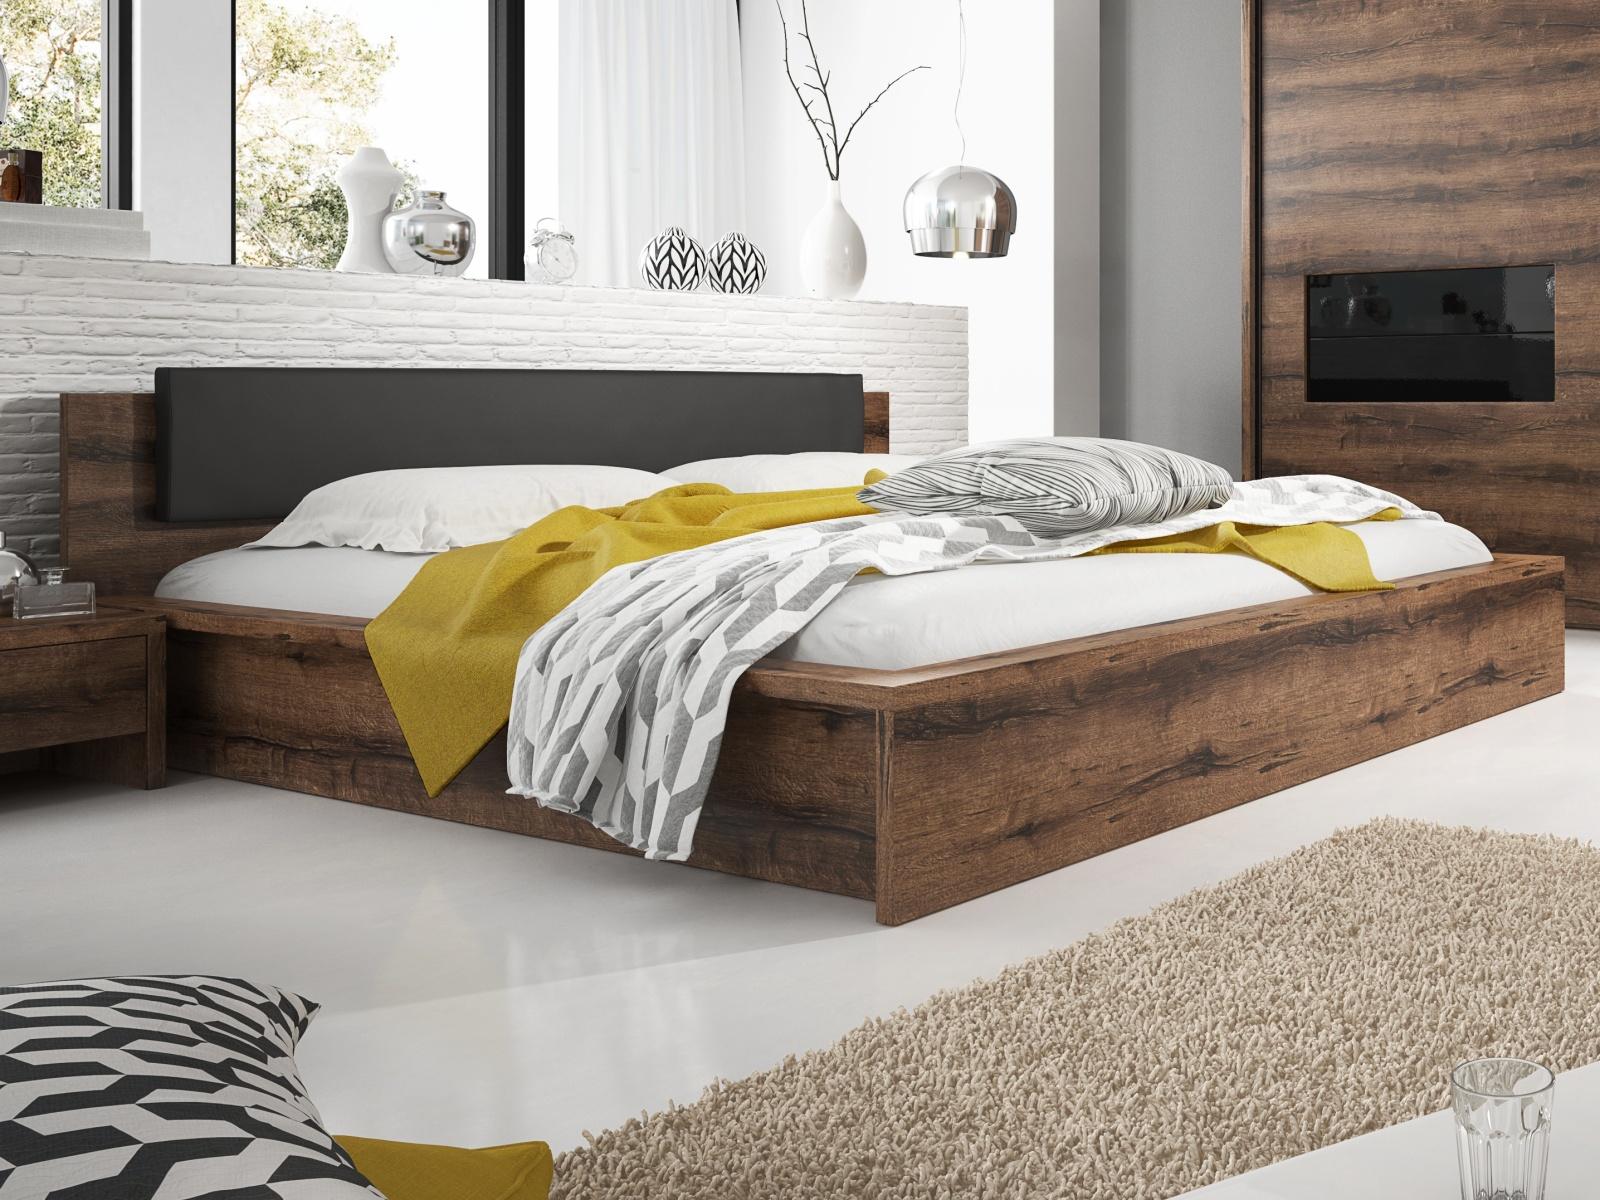 Smartshop INDIRA postel s roštem a úložným prostorem 180x200 cm TYP 52, dub monastery/černá